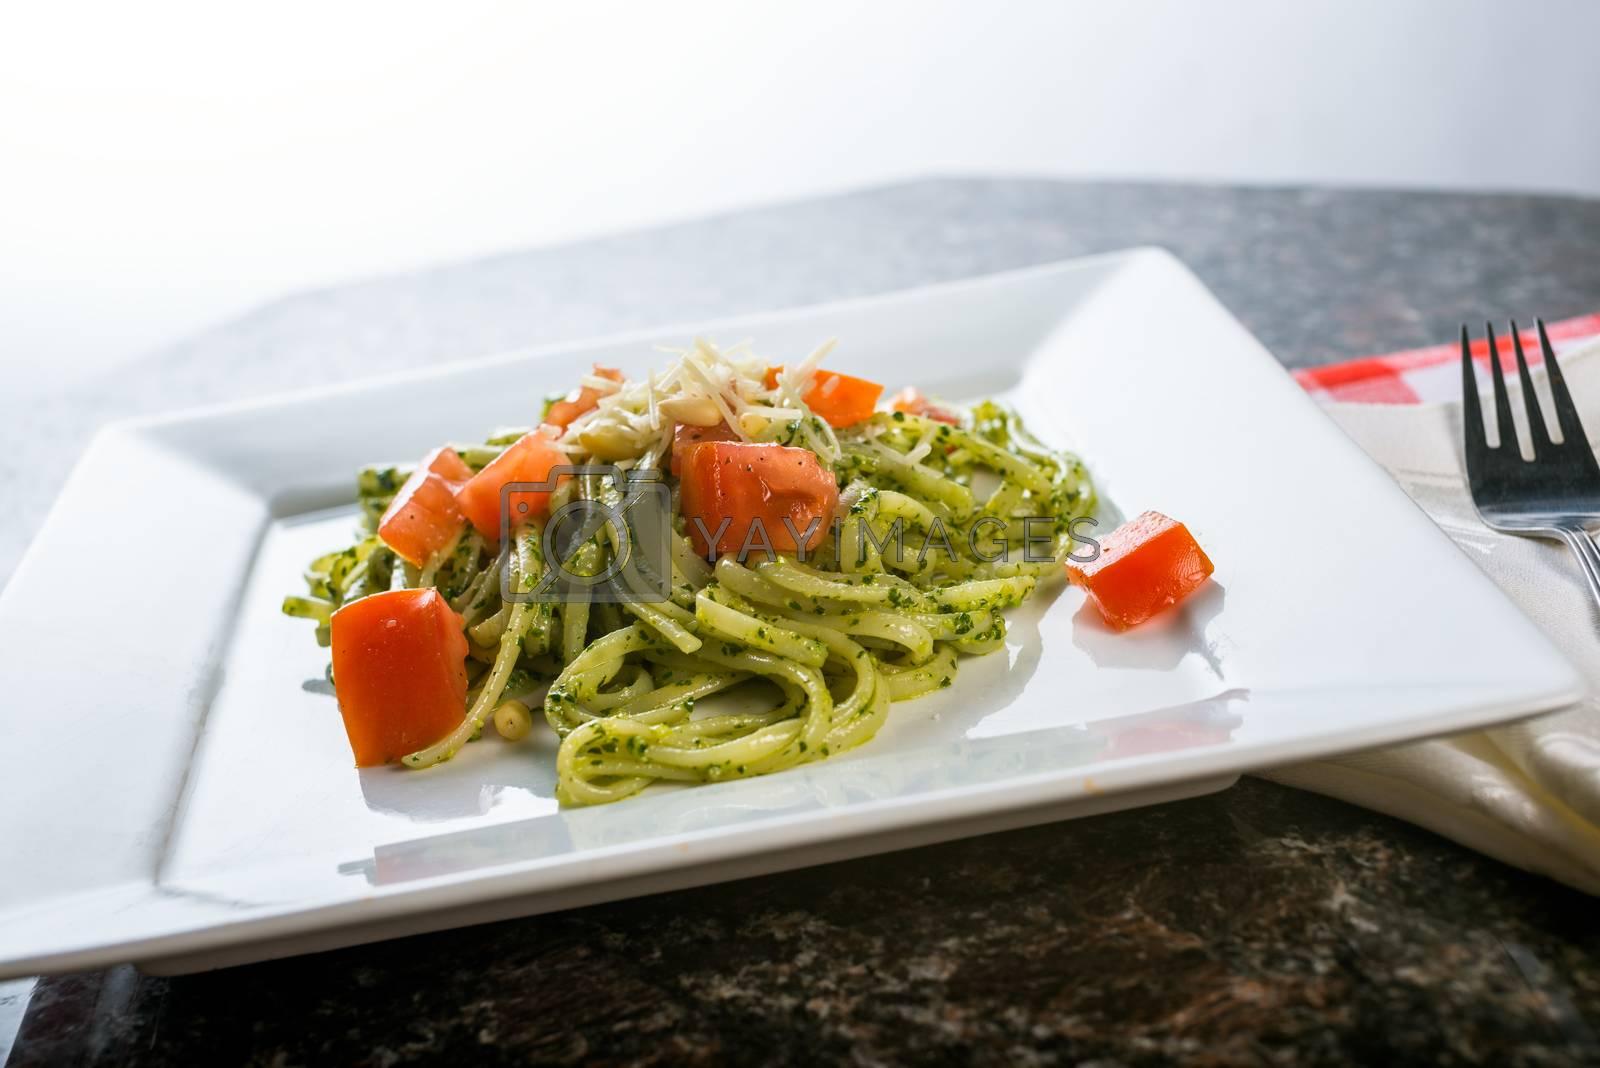 Royalty free image of Fettucini pasta with pesto sauce by Boyrcr420